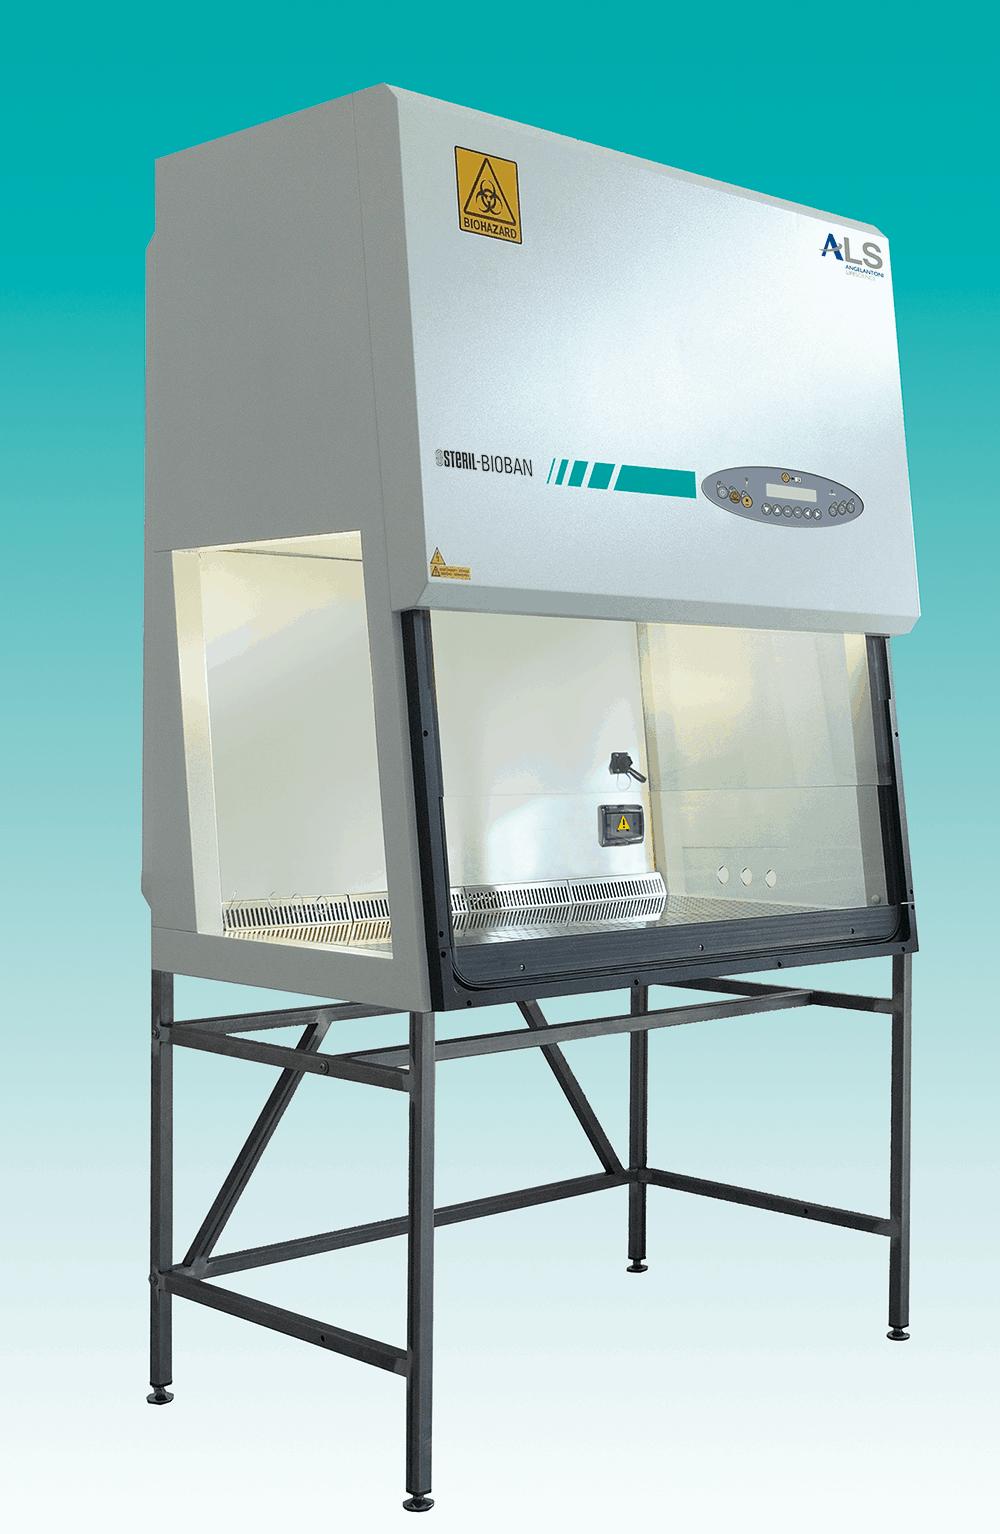 BIOBAN Biohazard Safety Cabinets